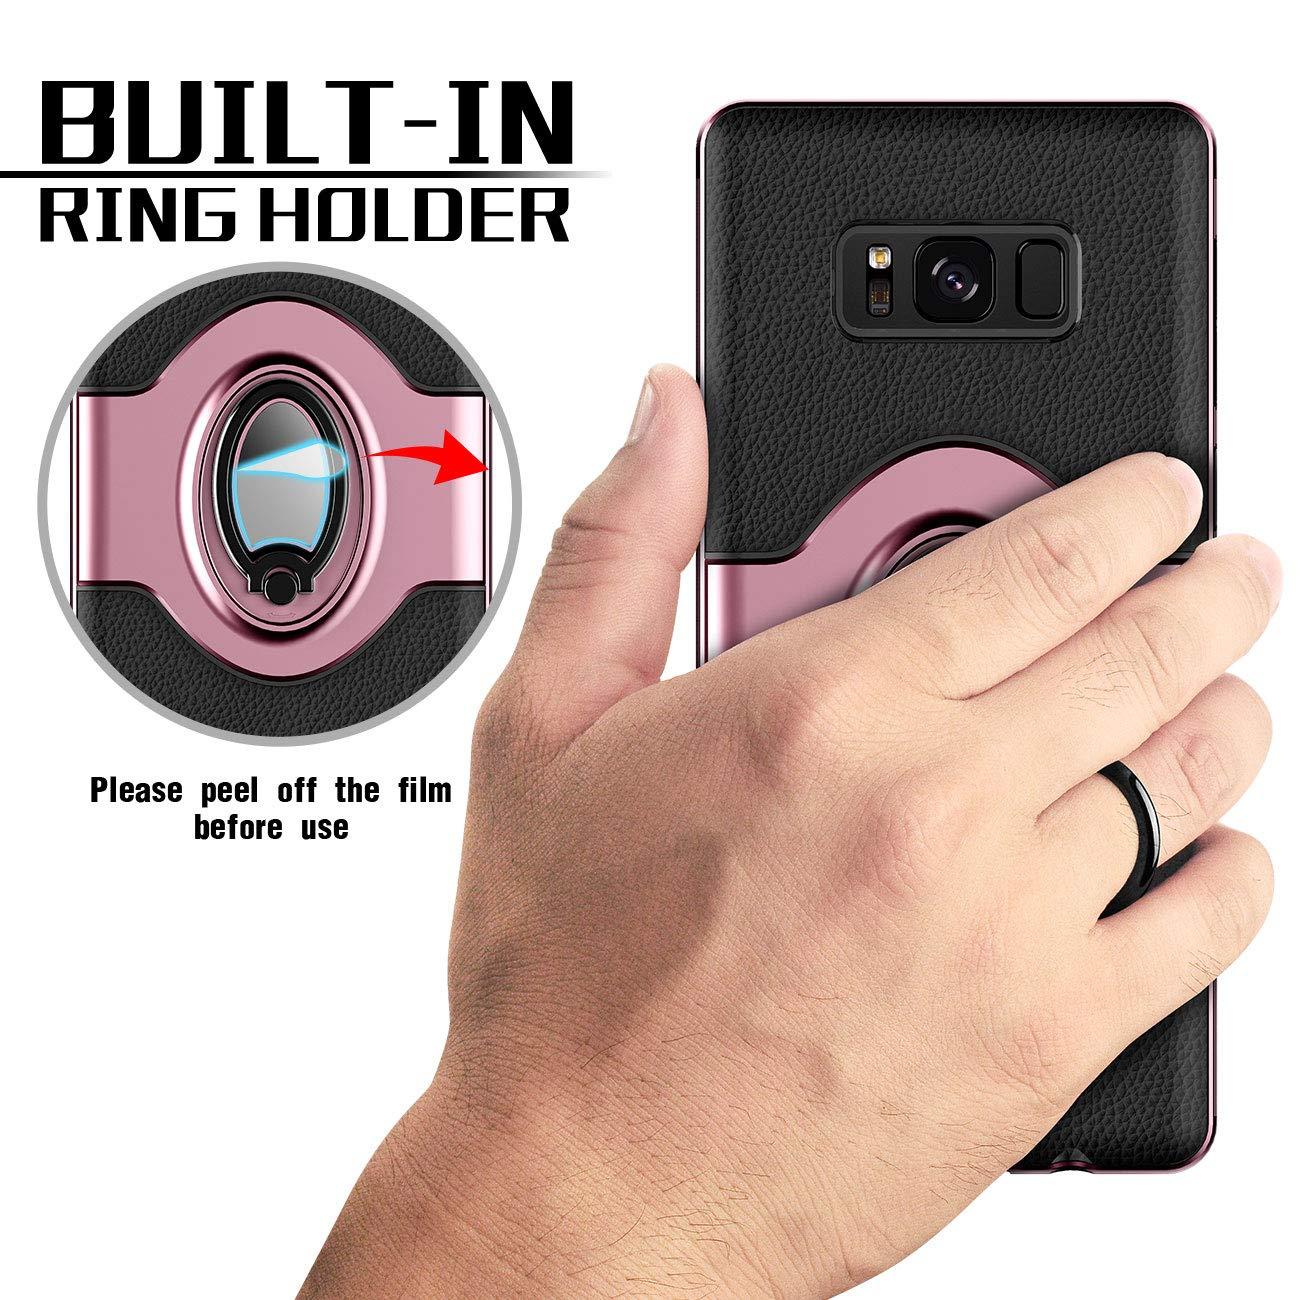 emobilepress 044S8P Dashboard Magnetic Phone Car Mount Navy Blue Samsung Galaxy S8 Plus Case eSamcore Ring Holder Kickstand Cases